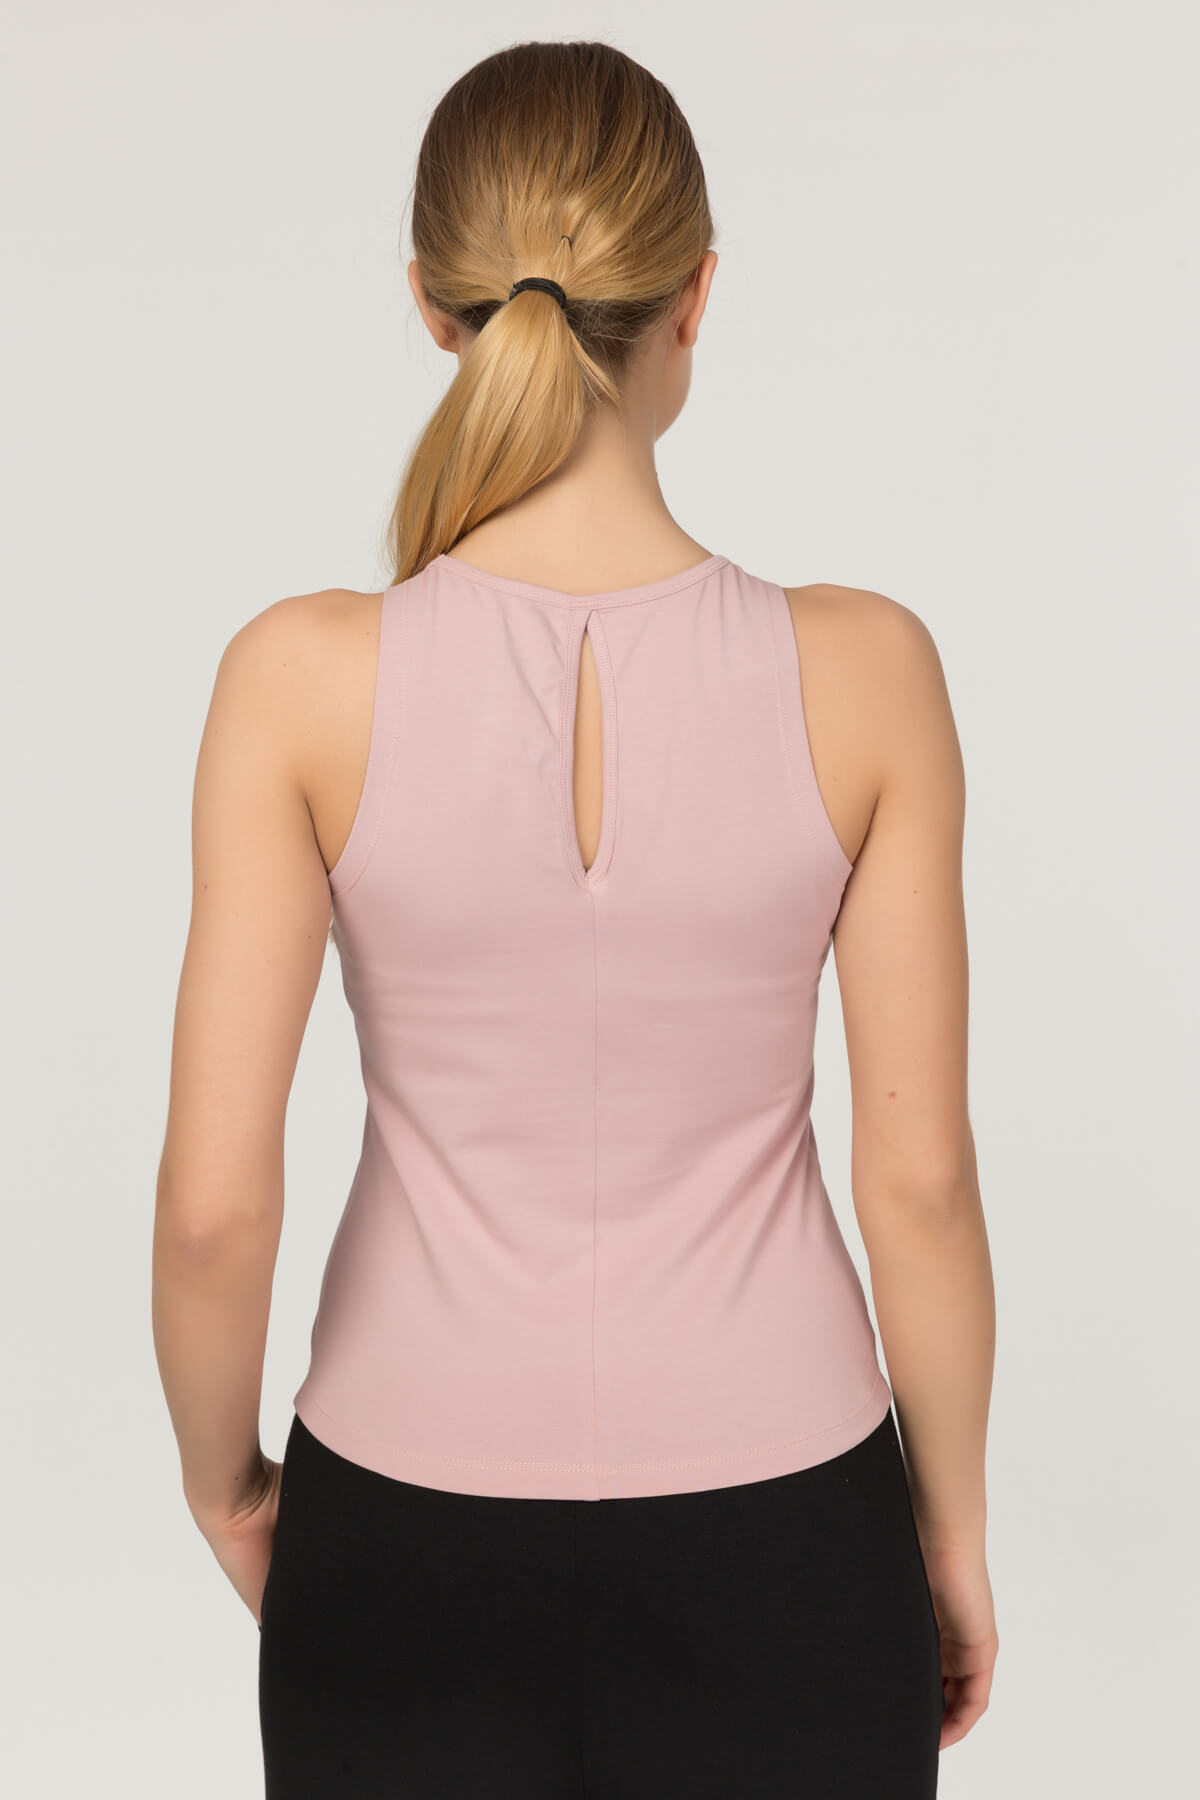 Bilcee Kadın Pamuklu Yoga Atleti FS-4018 BİLCEE